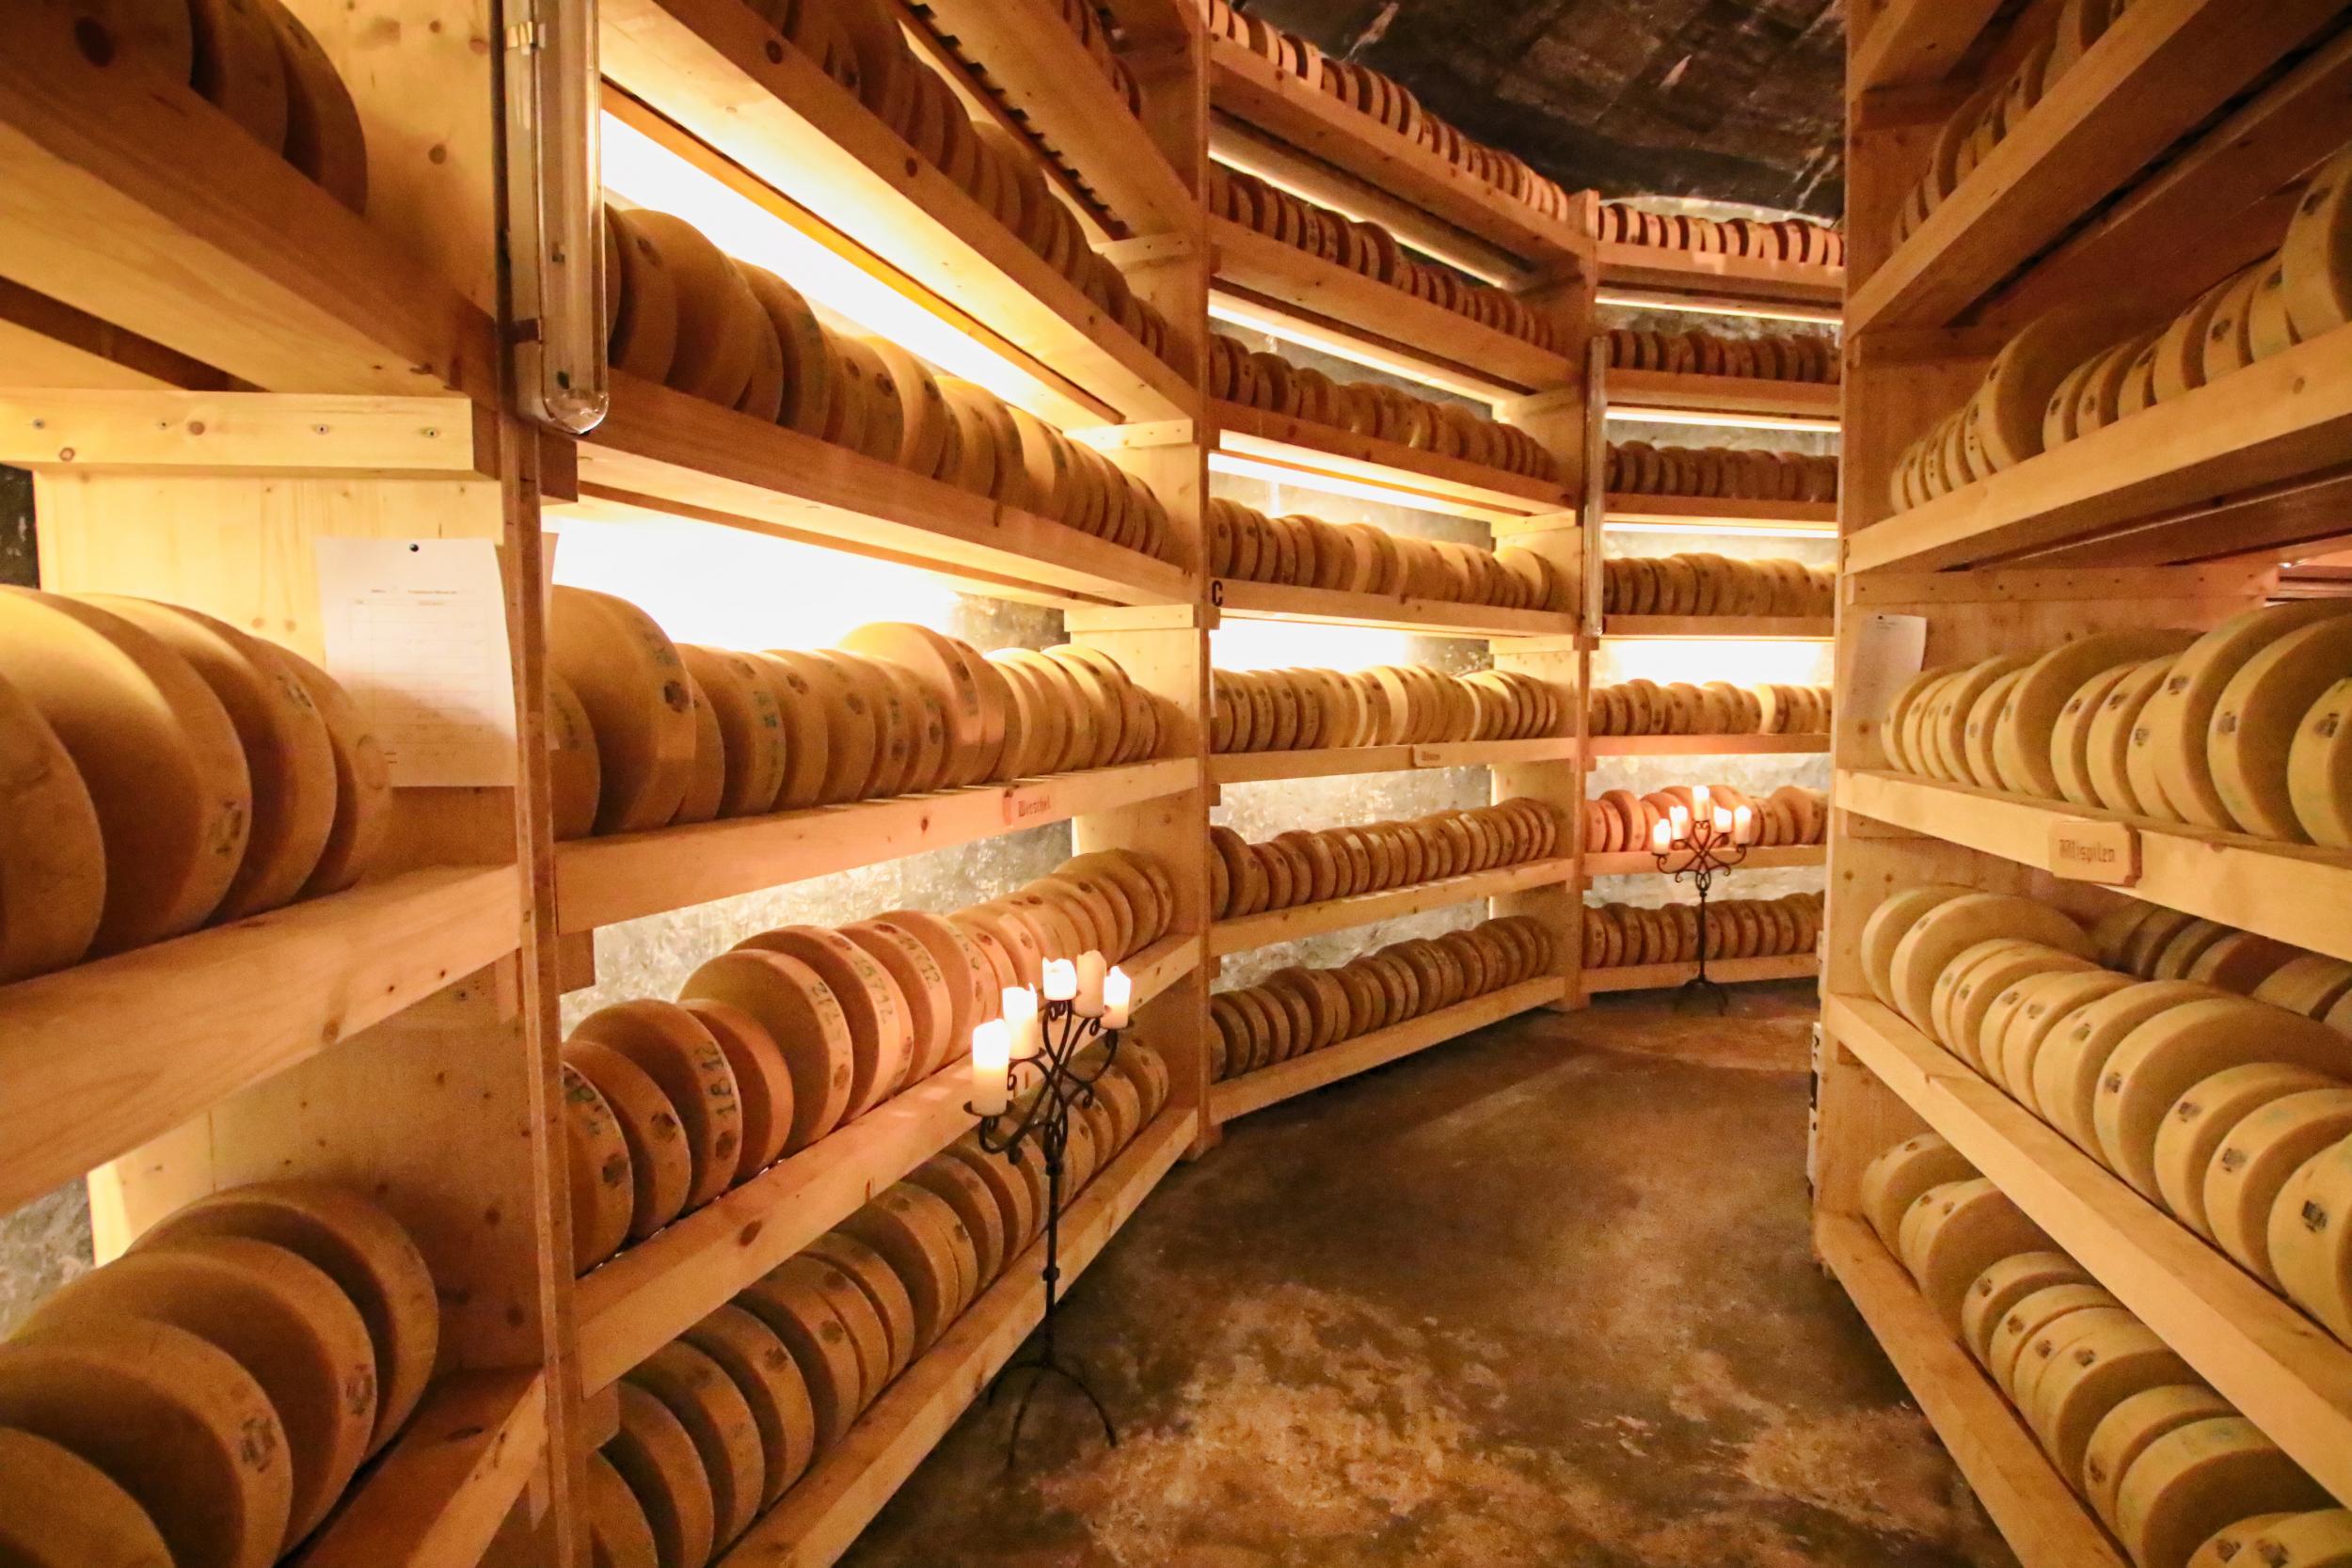 Exploring Switzerland's underground cheese cathedral